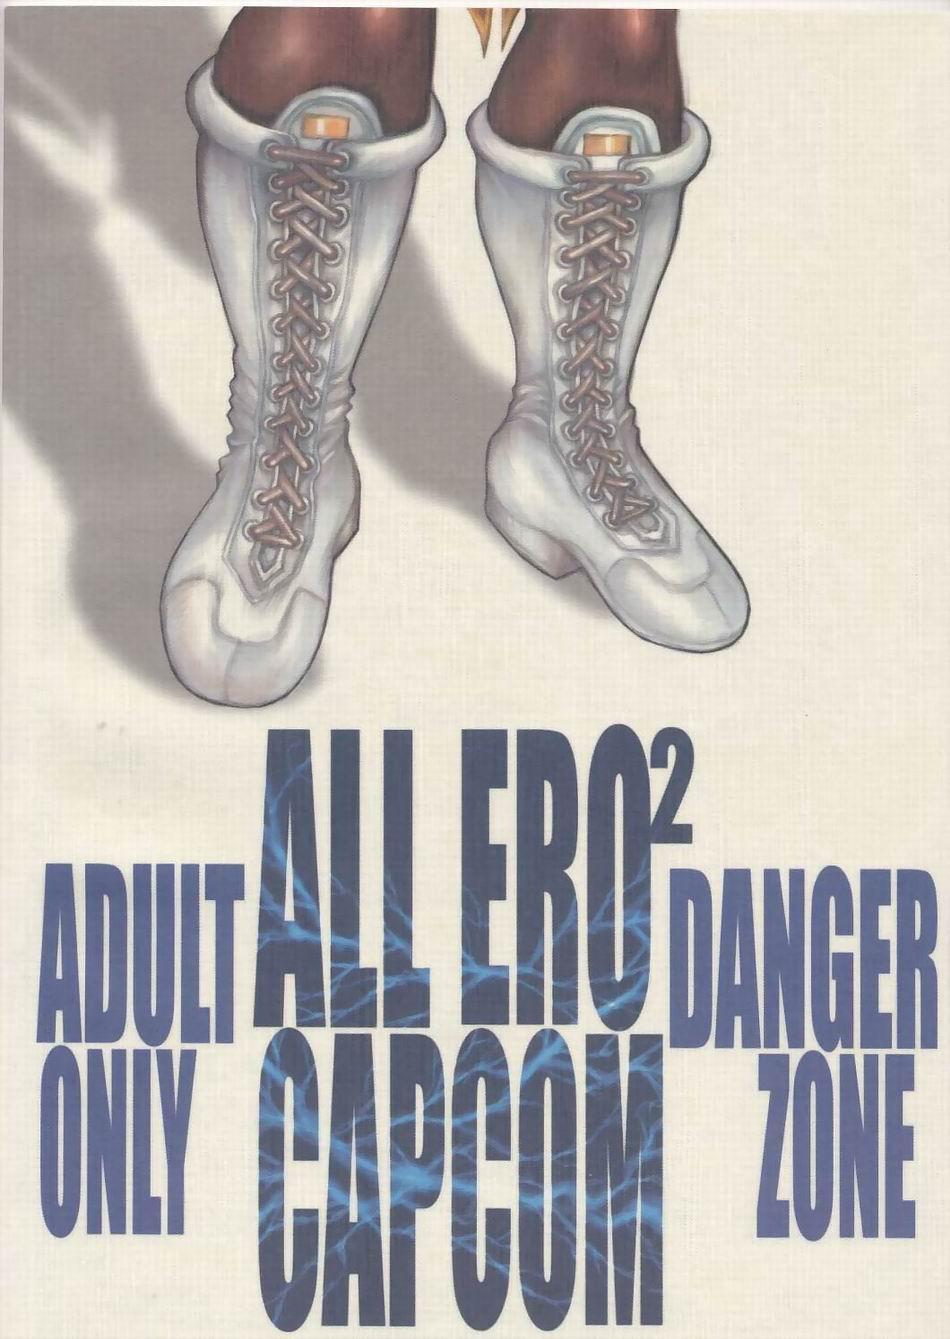 ALL ERO ERO CAPCOM DANGER ZONE 35